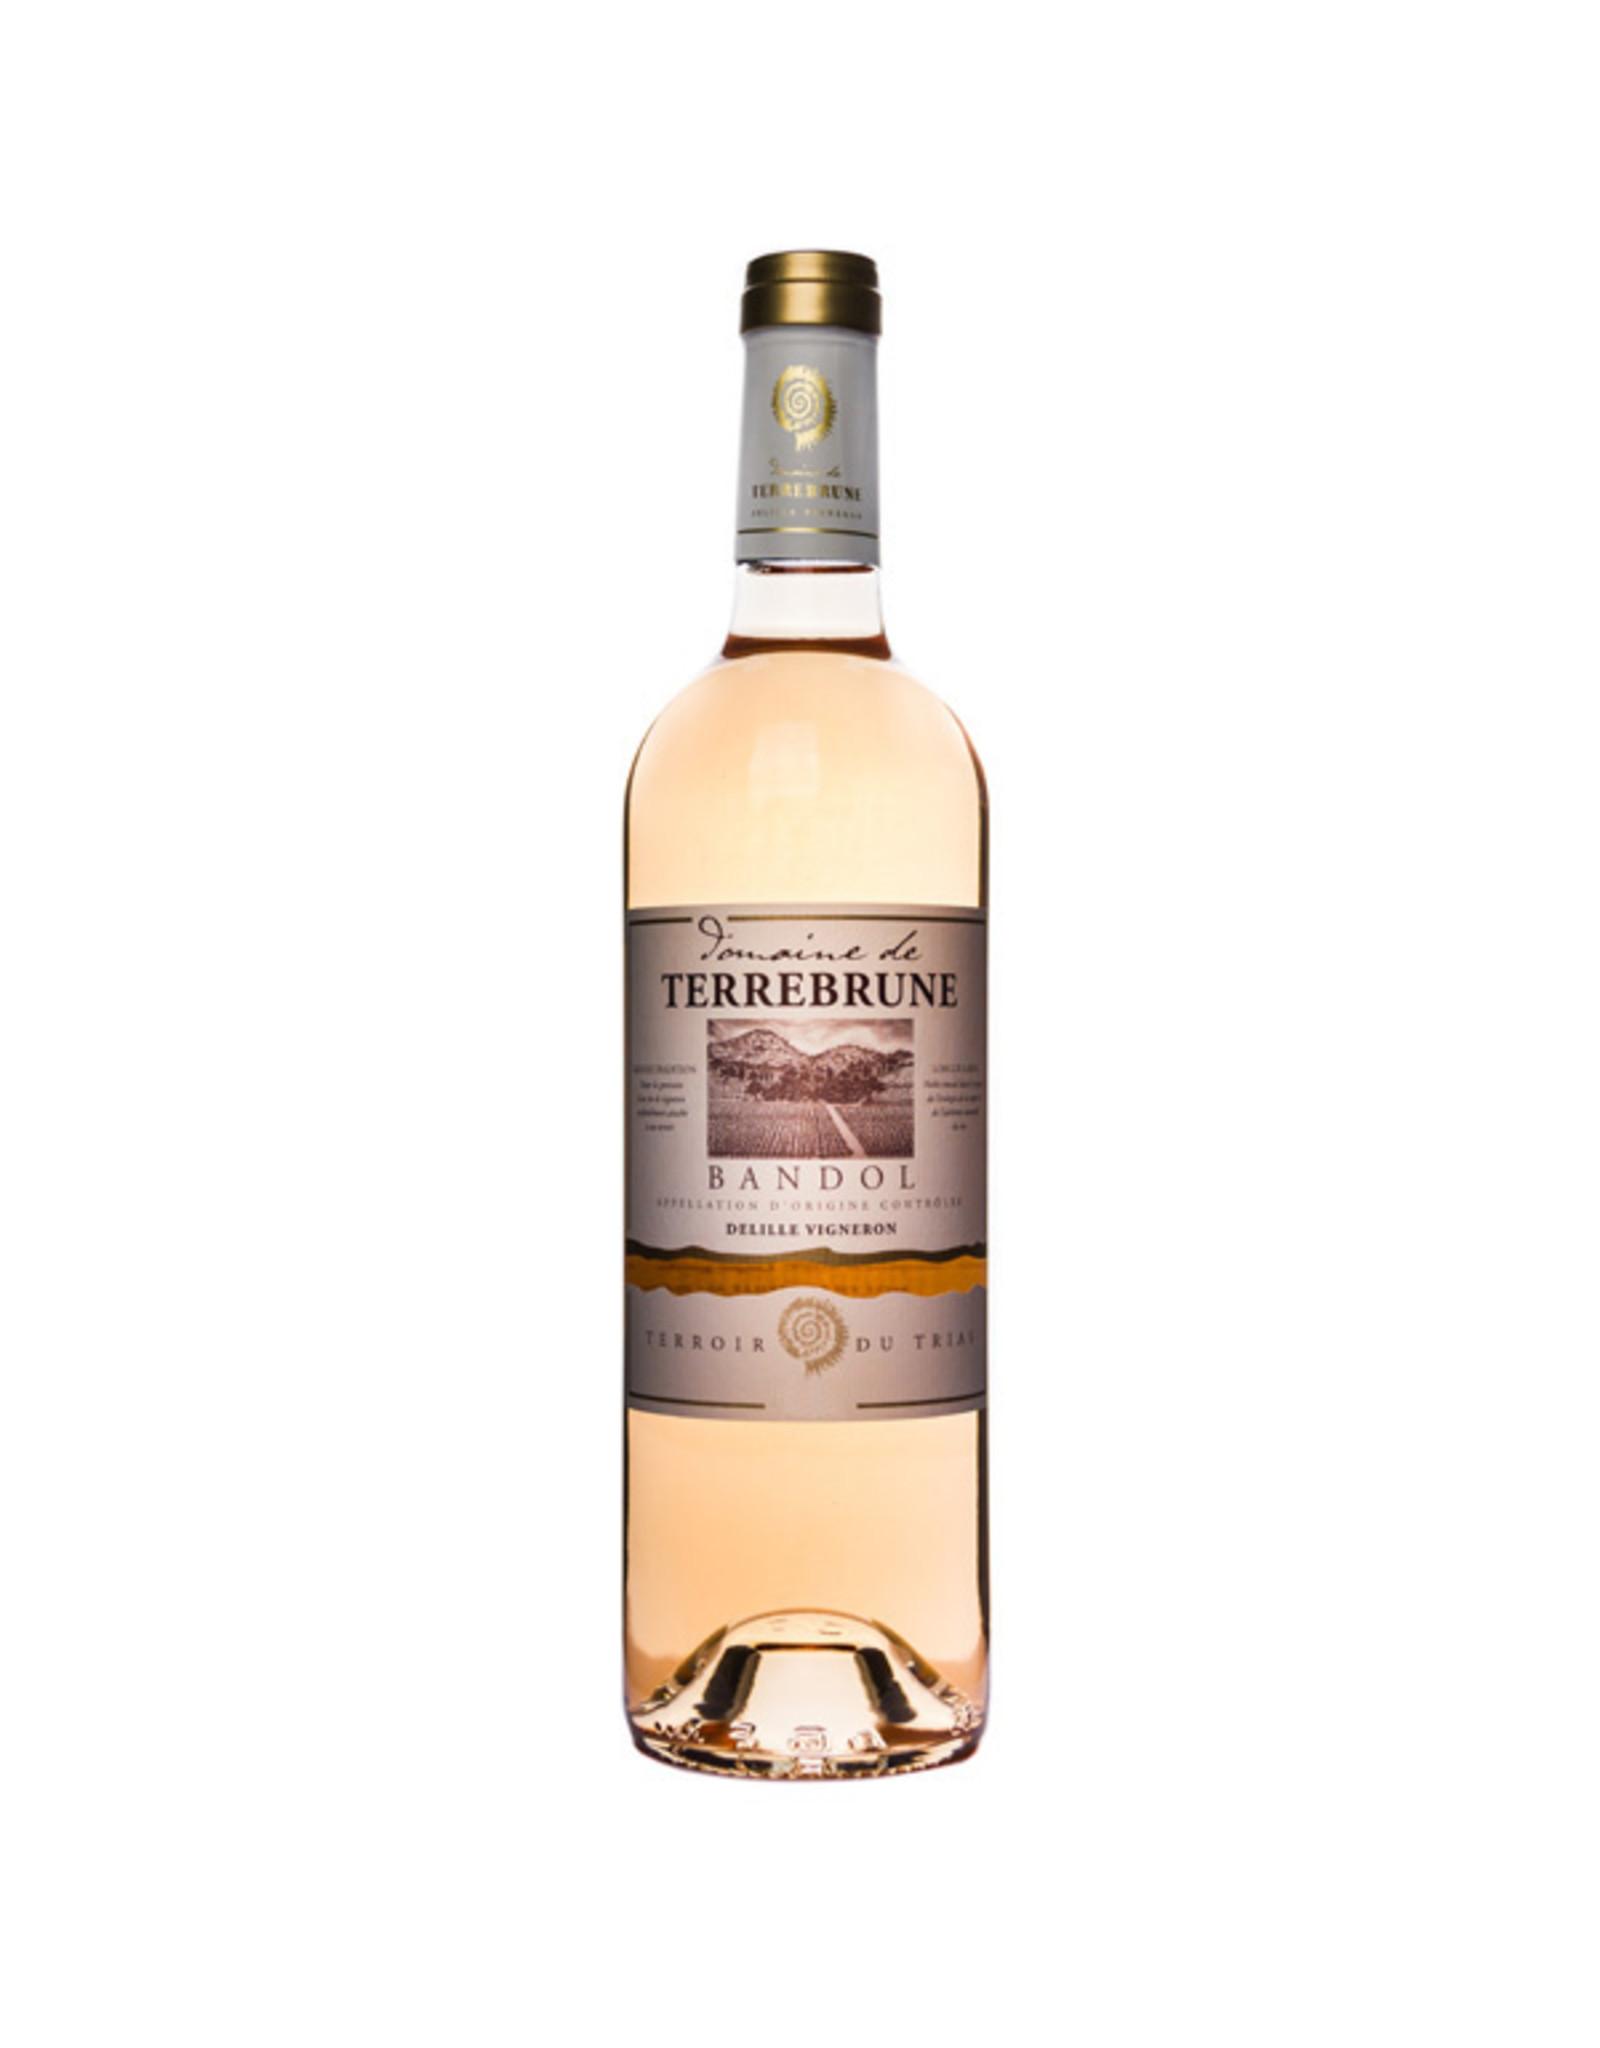 Domaine de Terrebrune, Ollioules Domaine de Terrebrune Bandol Rosé 2016